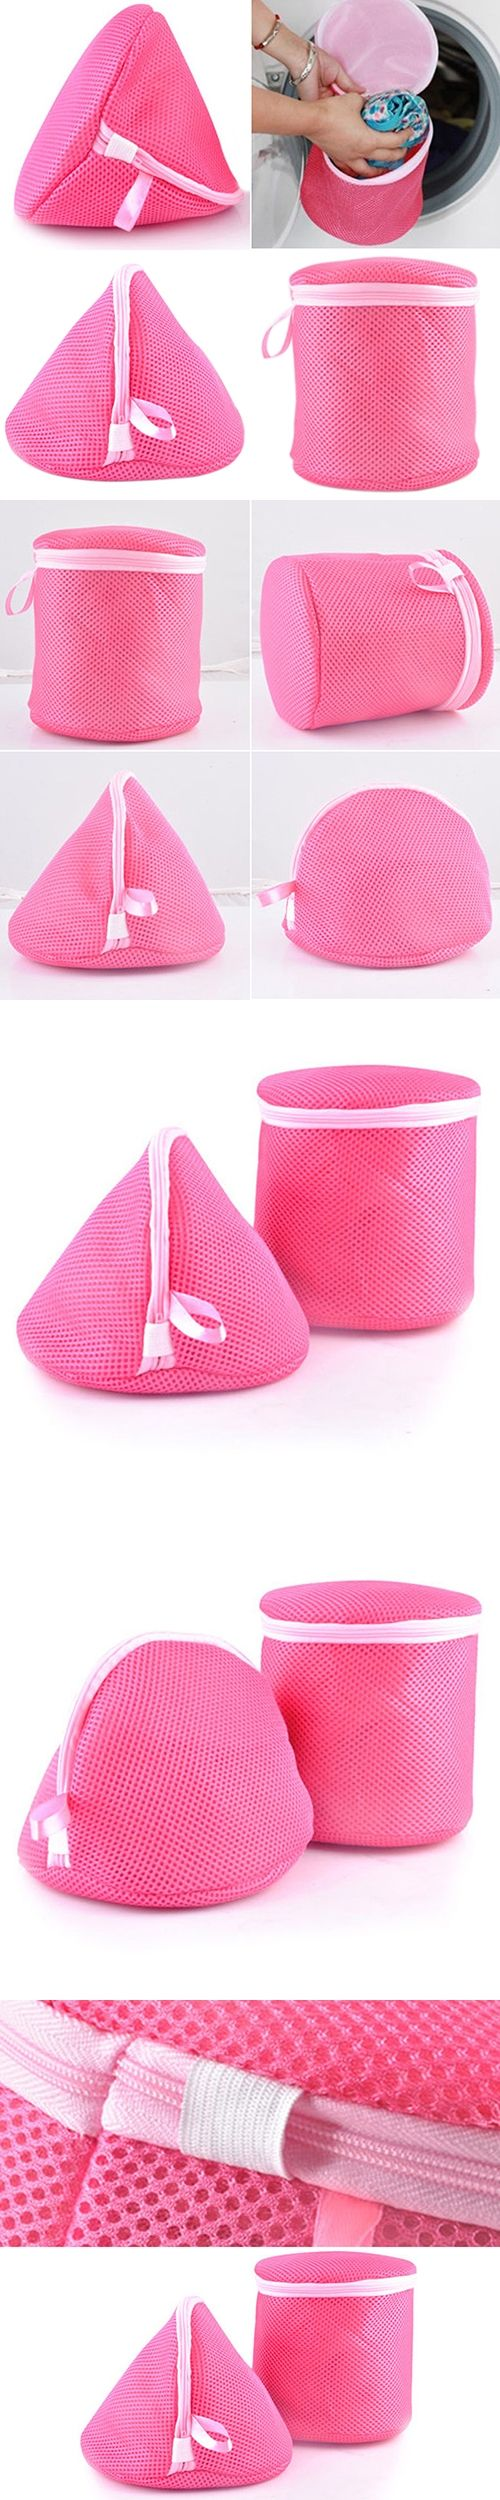 NEW Underwear Aid Bra Laundry Mesh Wash Basket Net Washing Storage Zipper Bag BICI